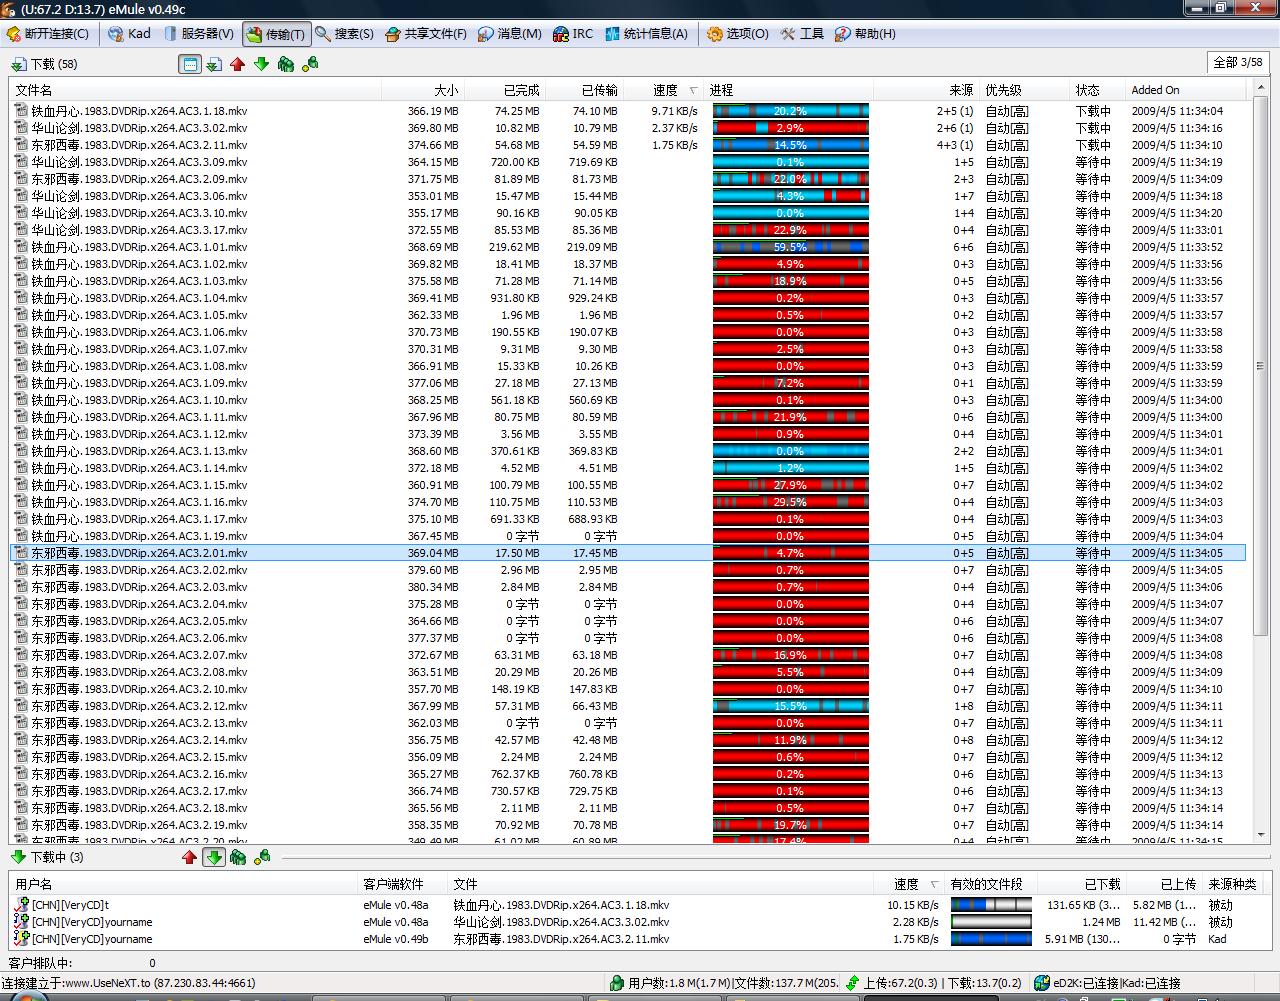 emule version 0.49c